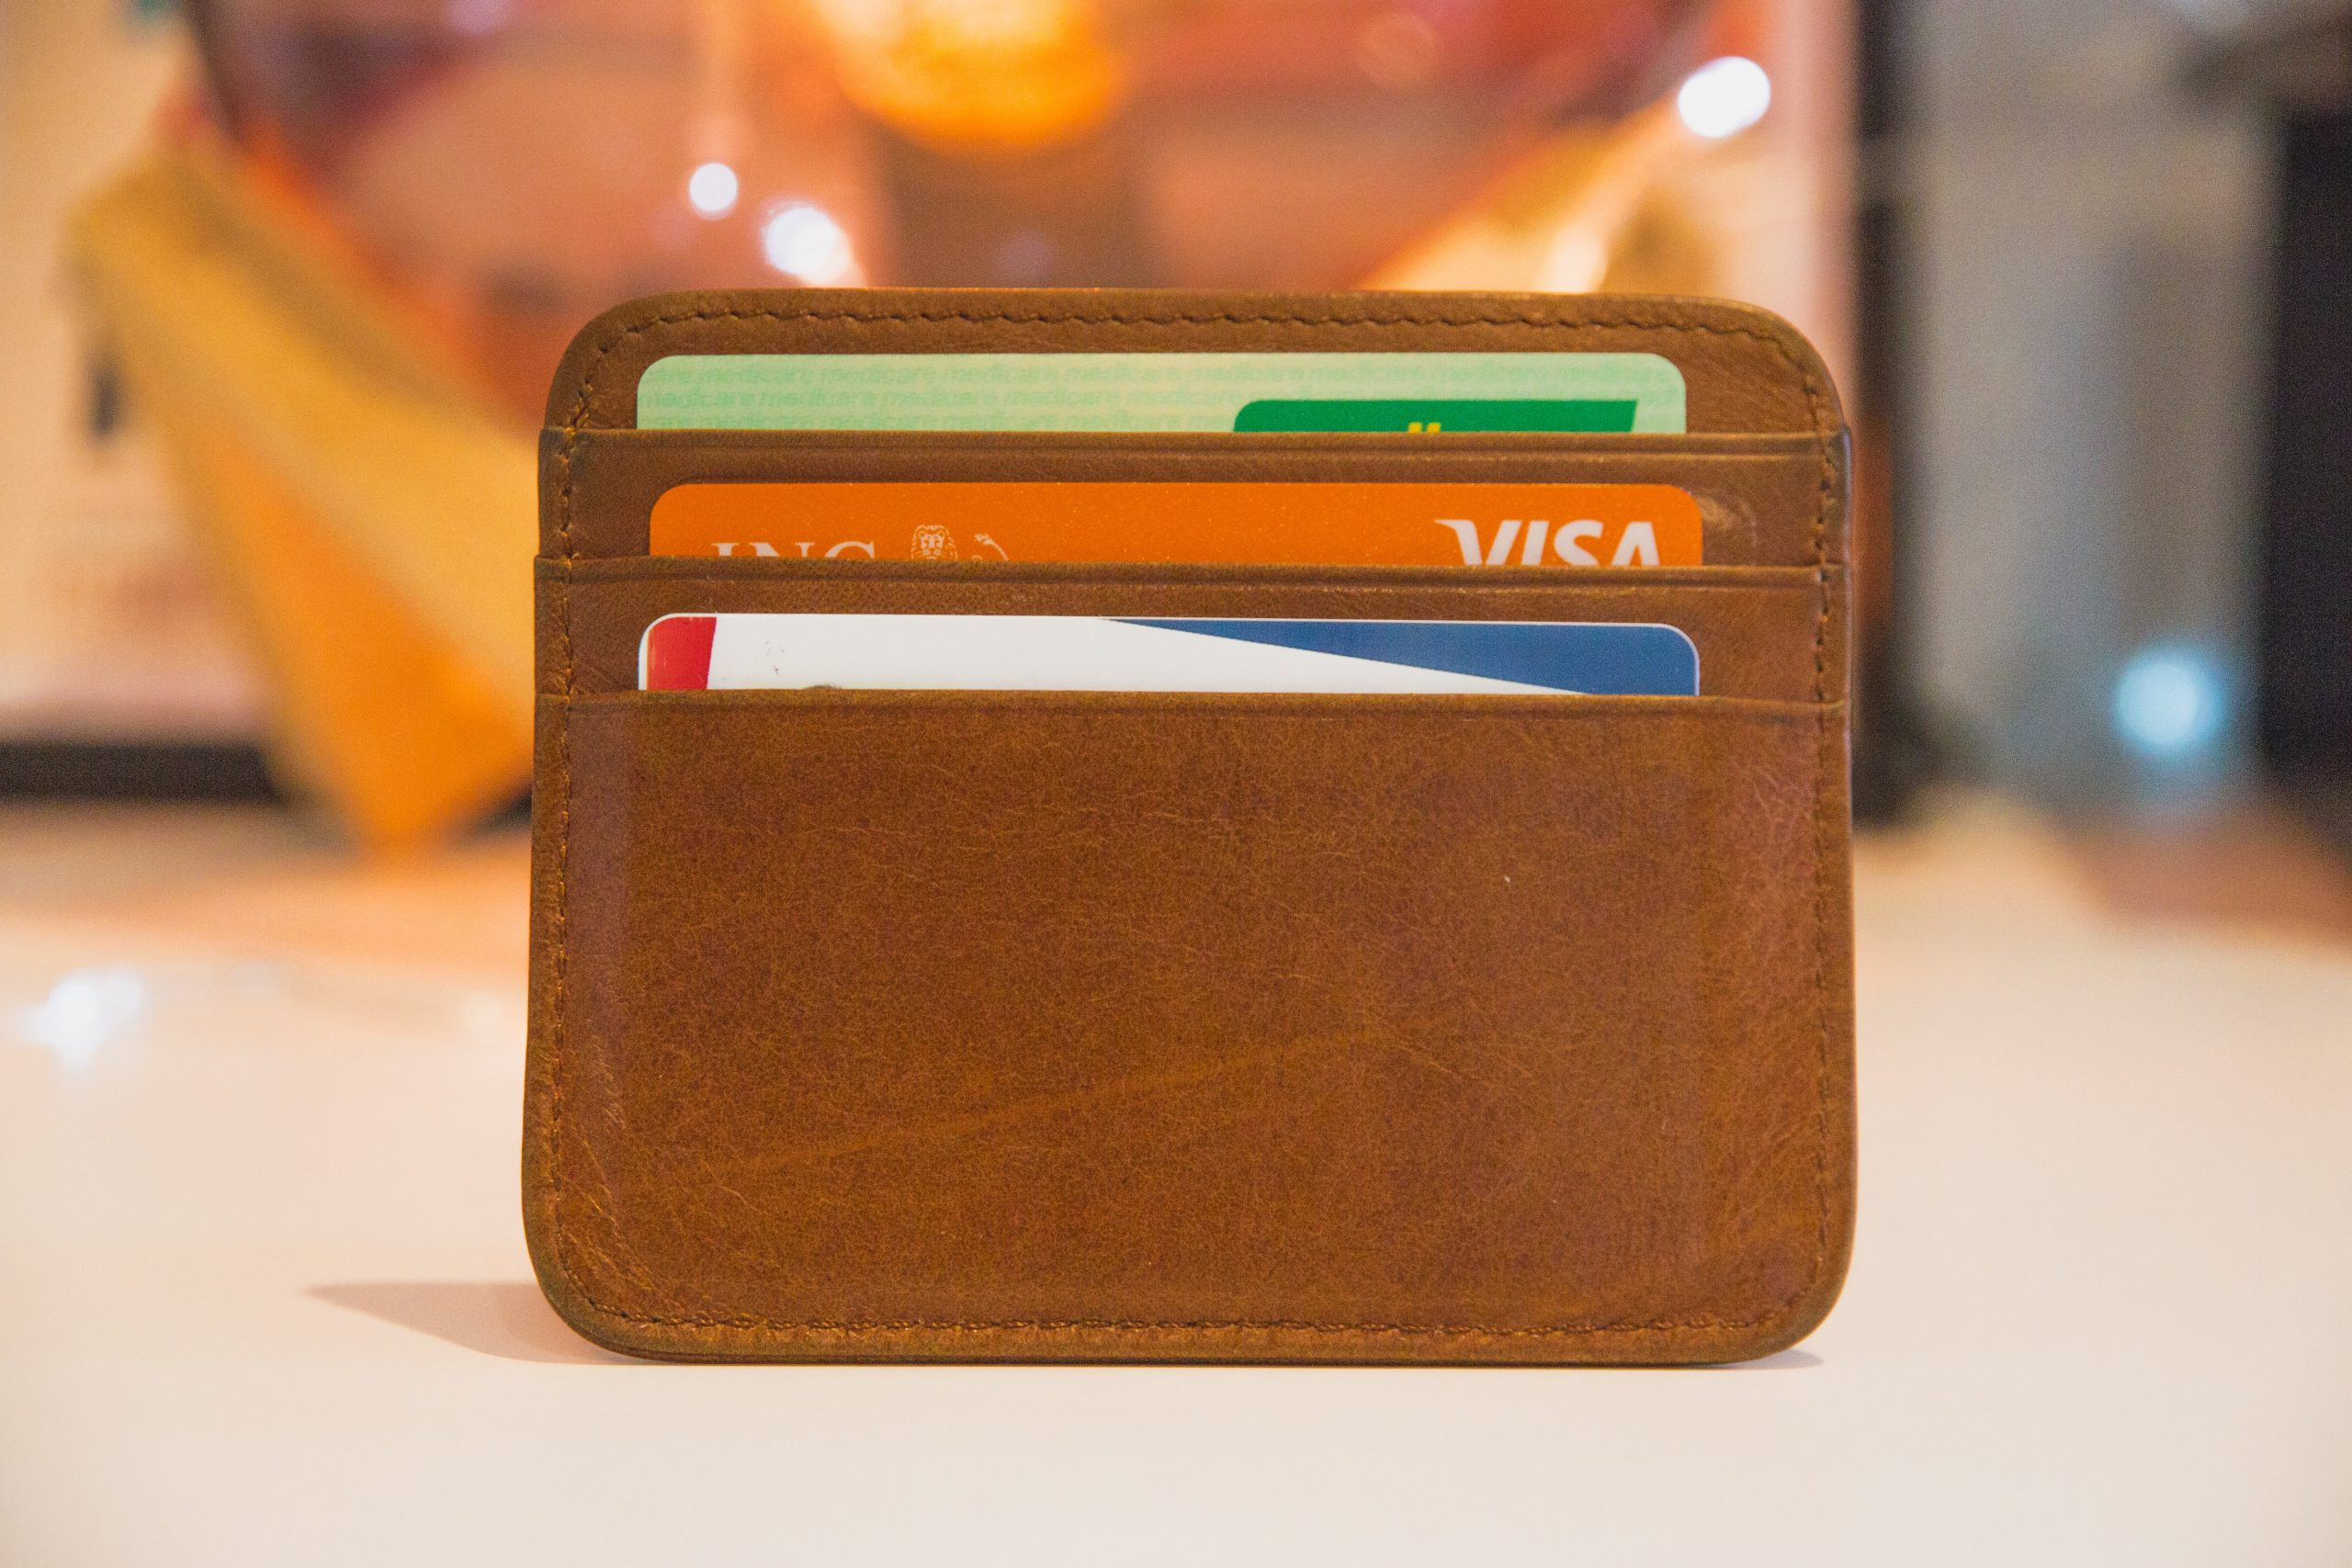 Understanding the Use of Kredittkort (Credit Cards)